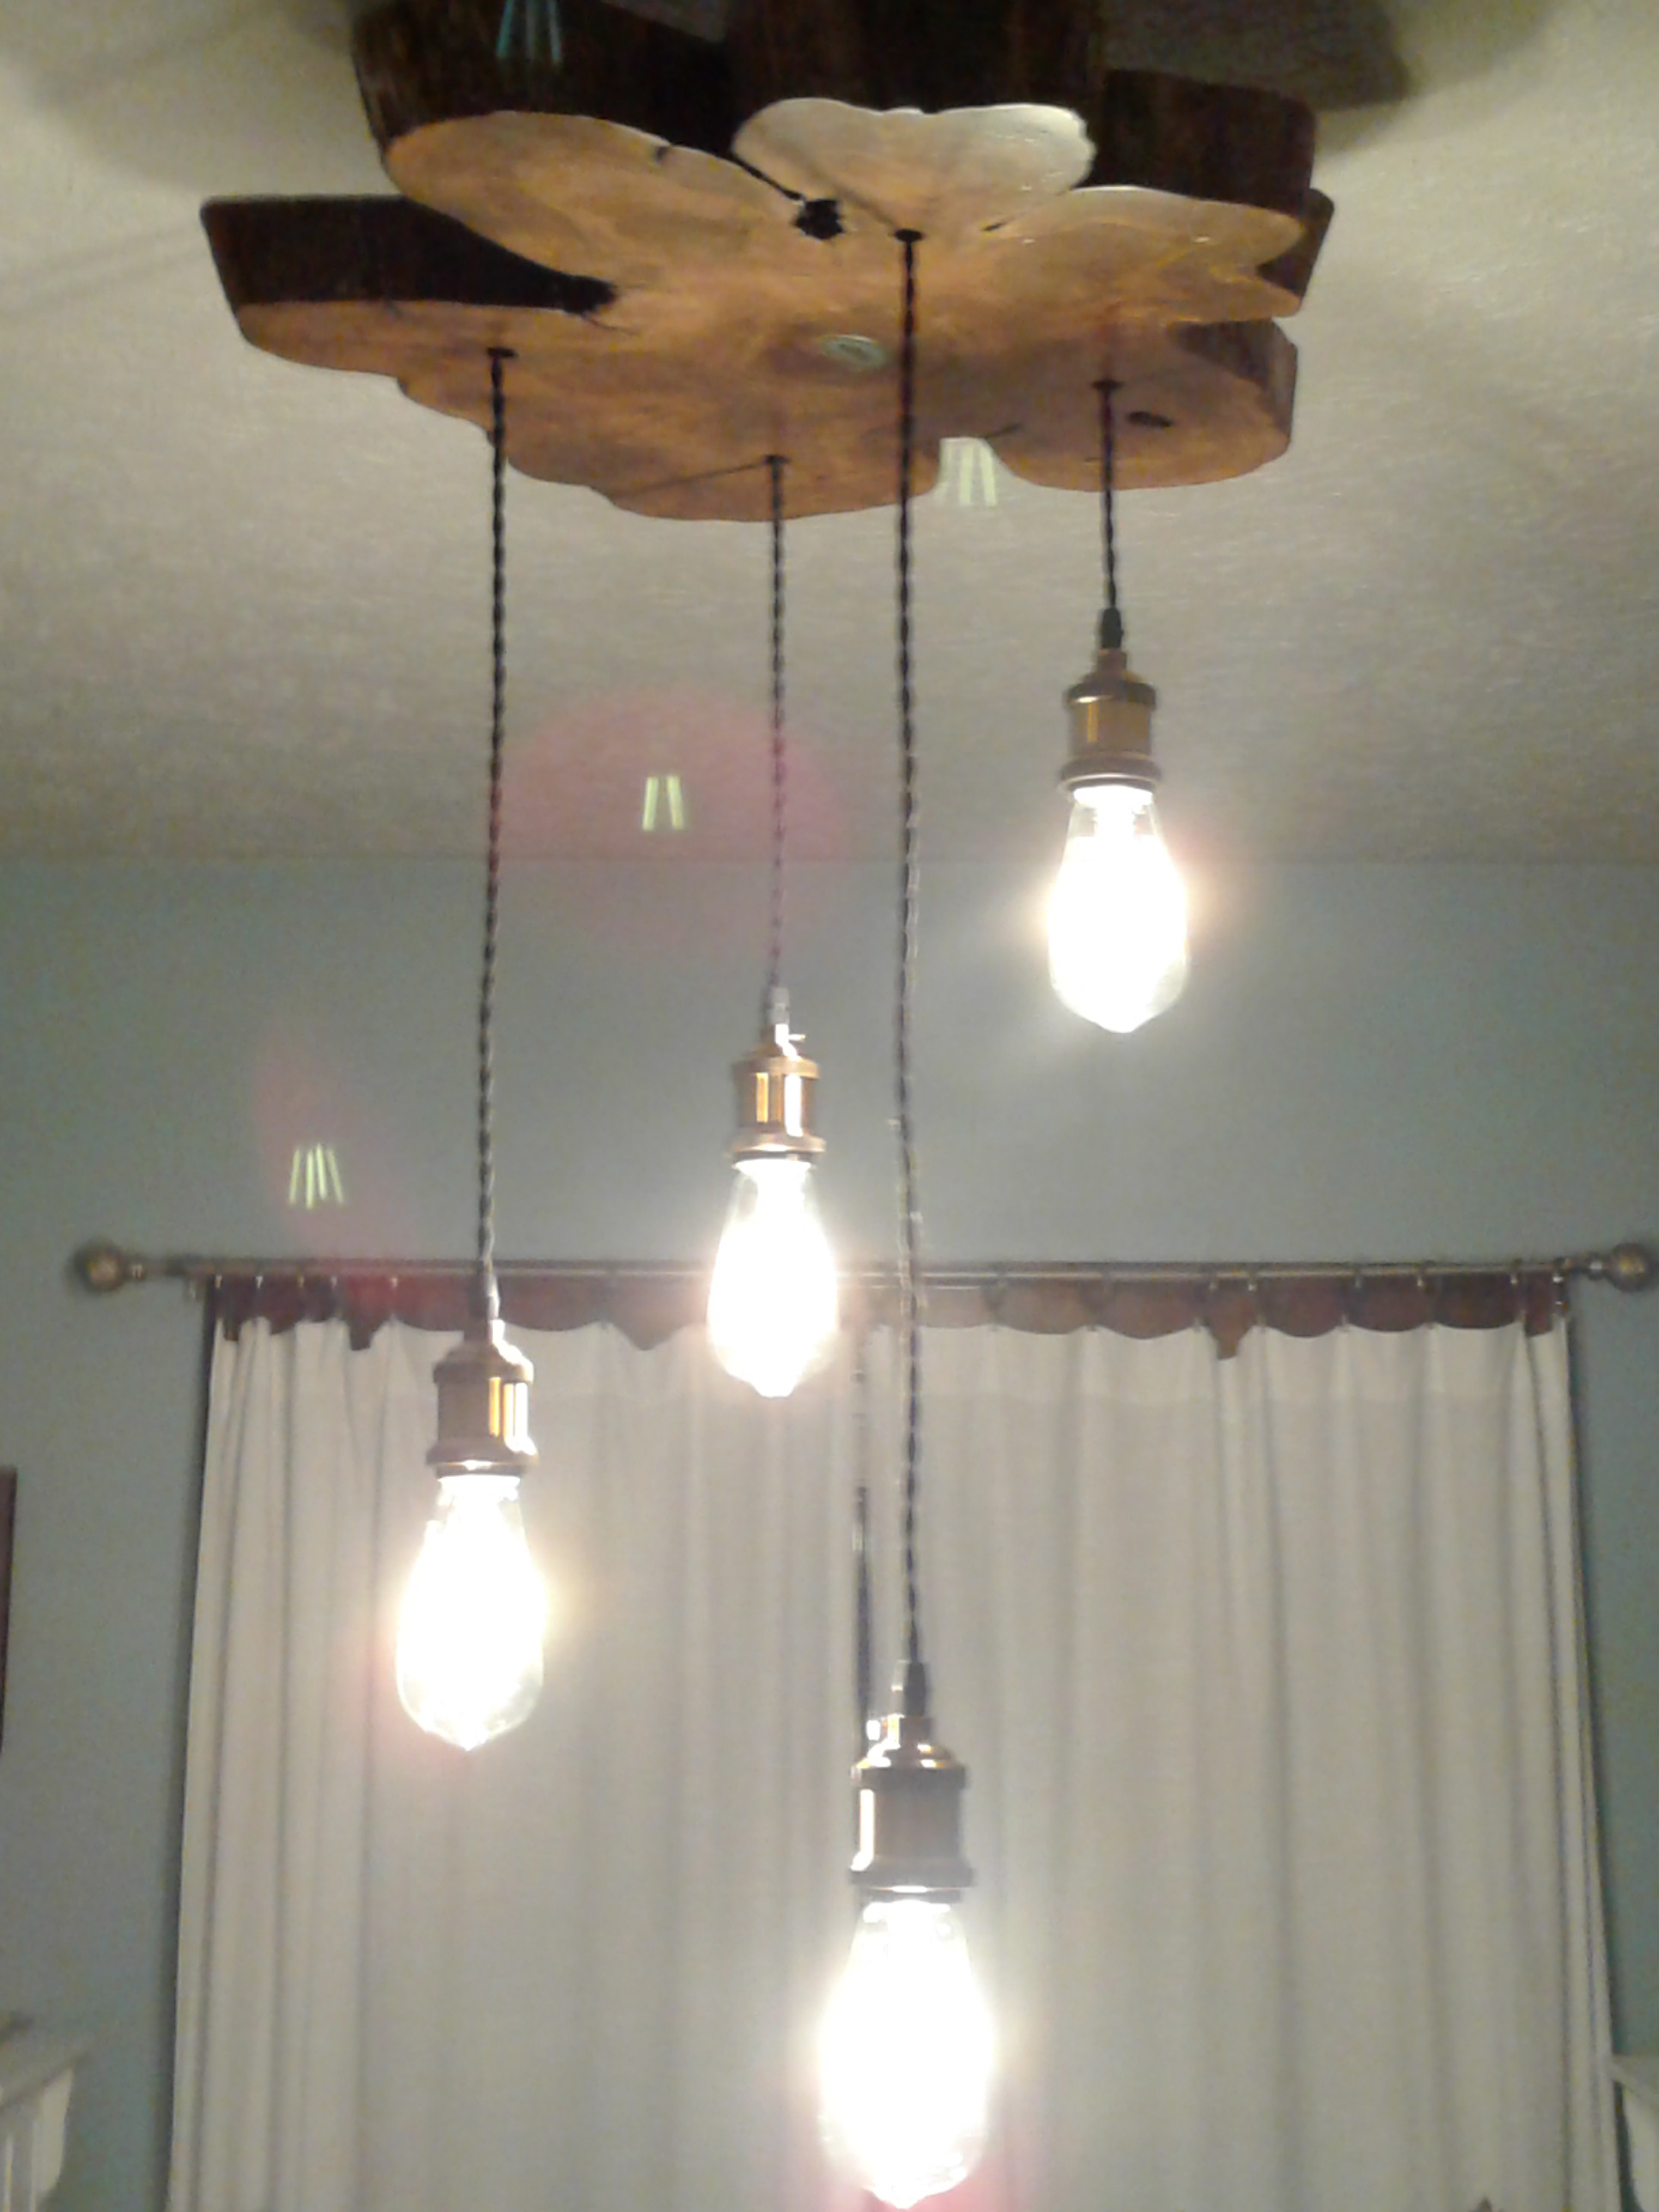 Picture of Lighting, Incandesent Vs LED